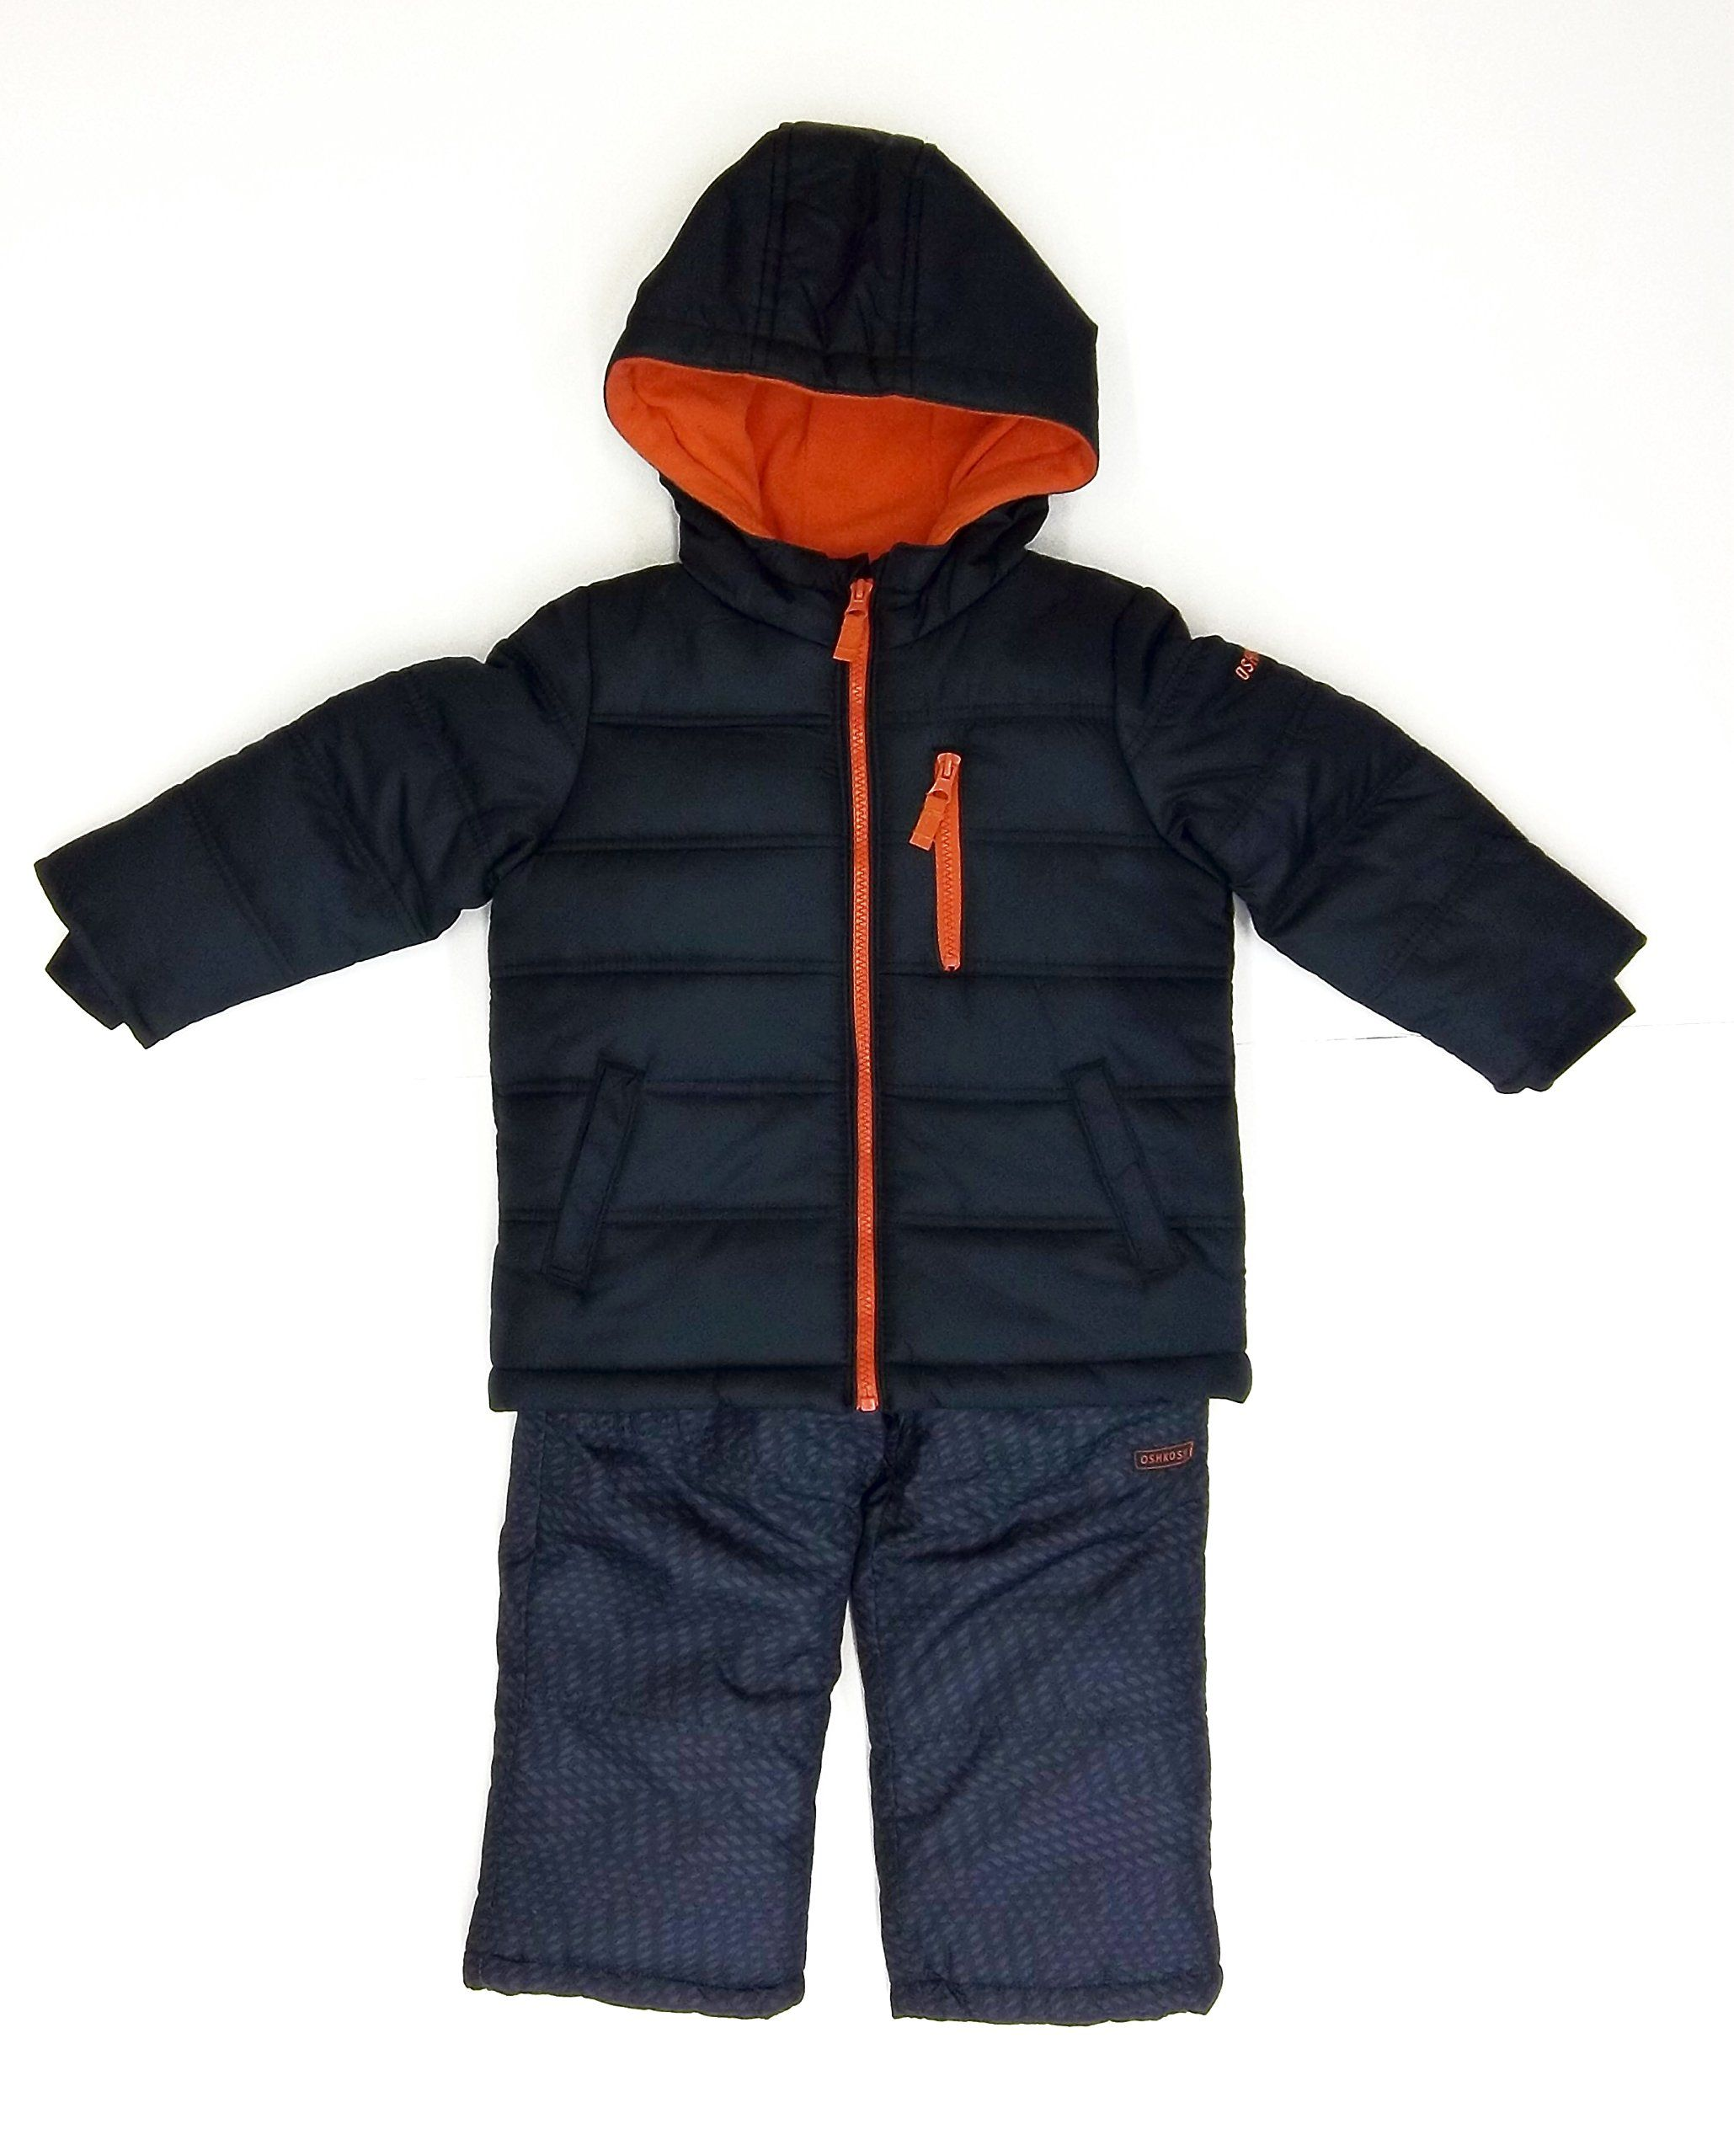 13f747fcf OshKosh B gosh Toddler Boys 2 Piece Snow Suit. 100% Polyester ...